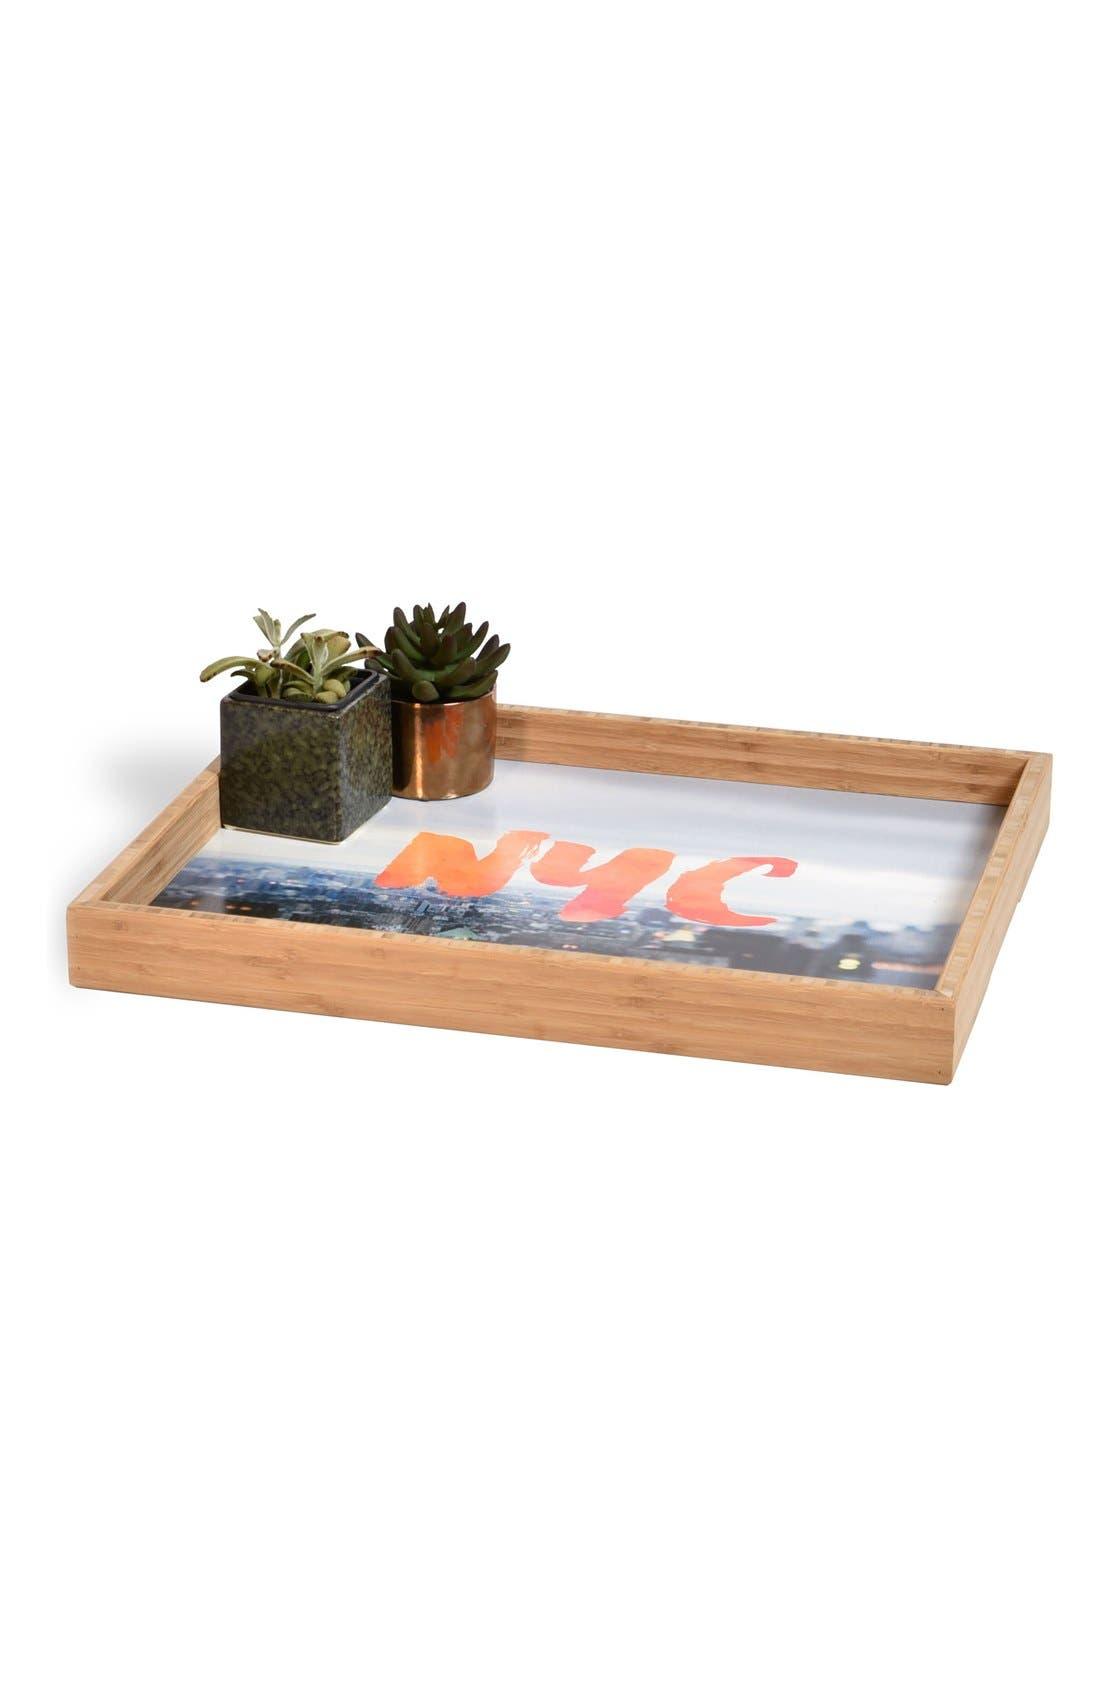 'NYC Skyline' Decorative Serving Tray,                             Alternate thumbnail 3, color,                             Orange